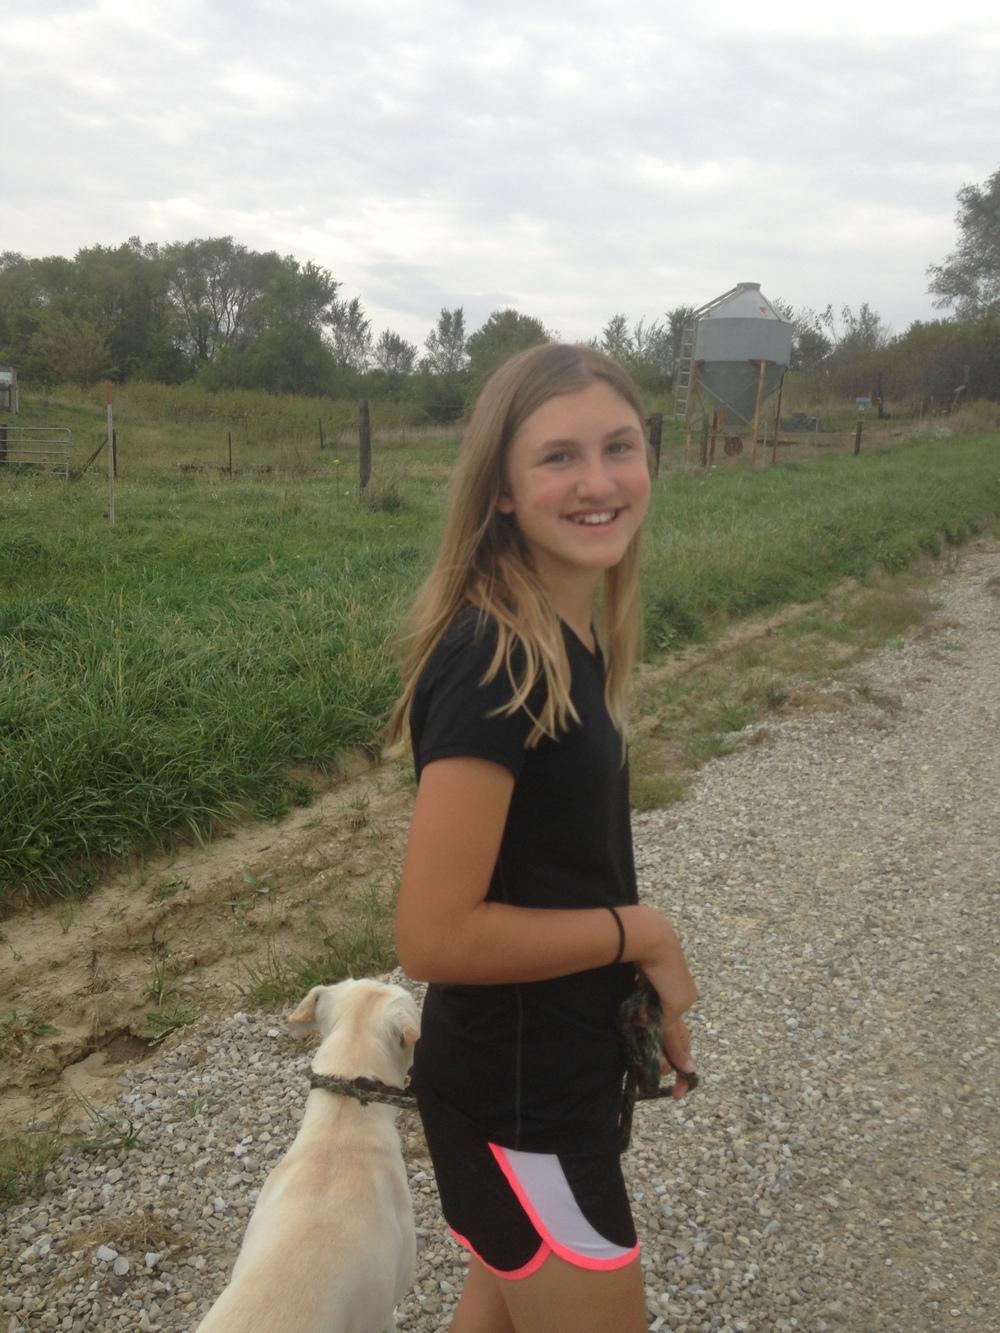 Ashlee-Smiling-On-Walk.jpg